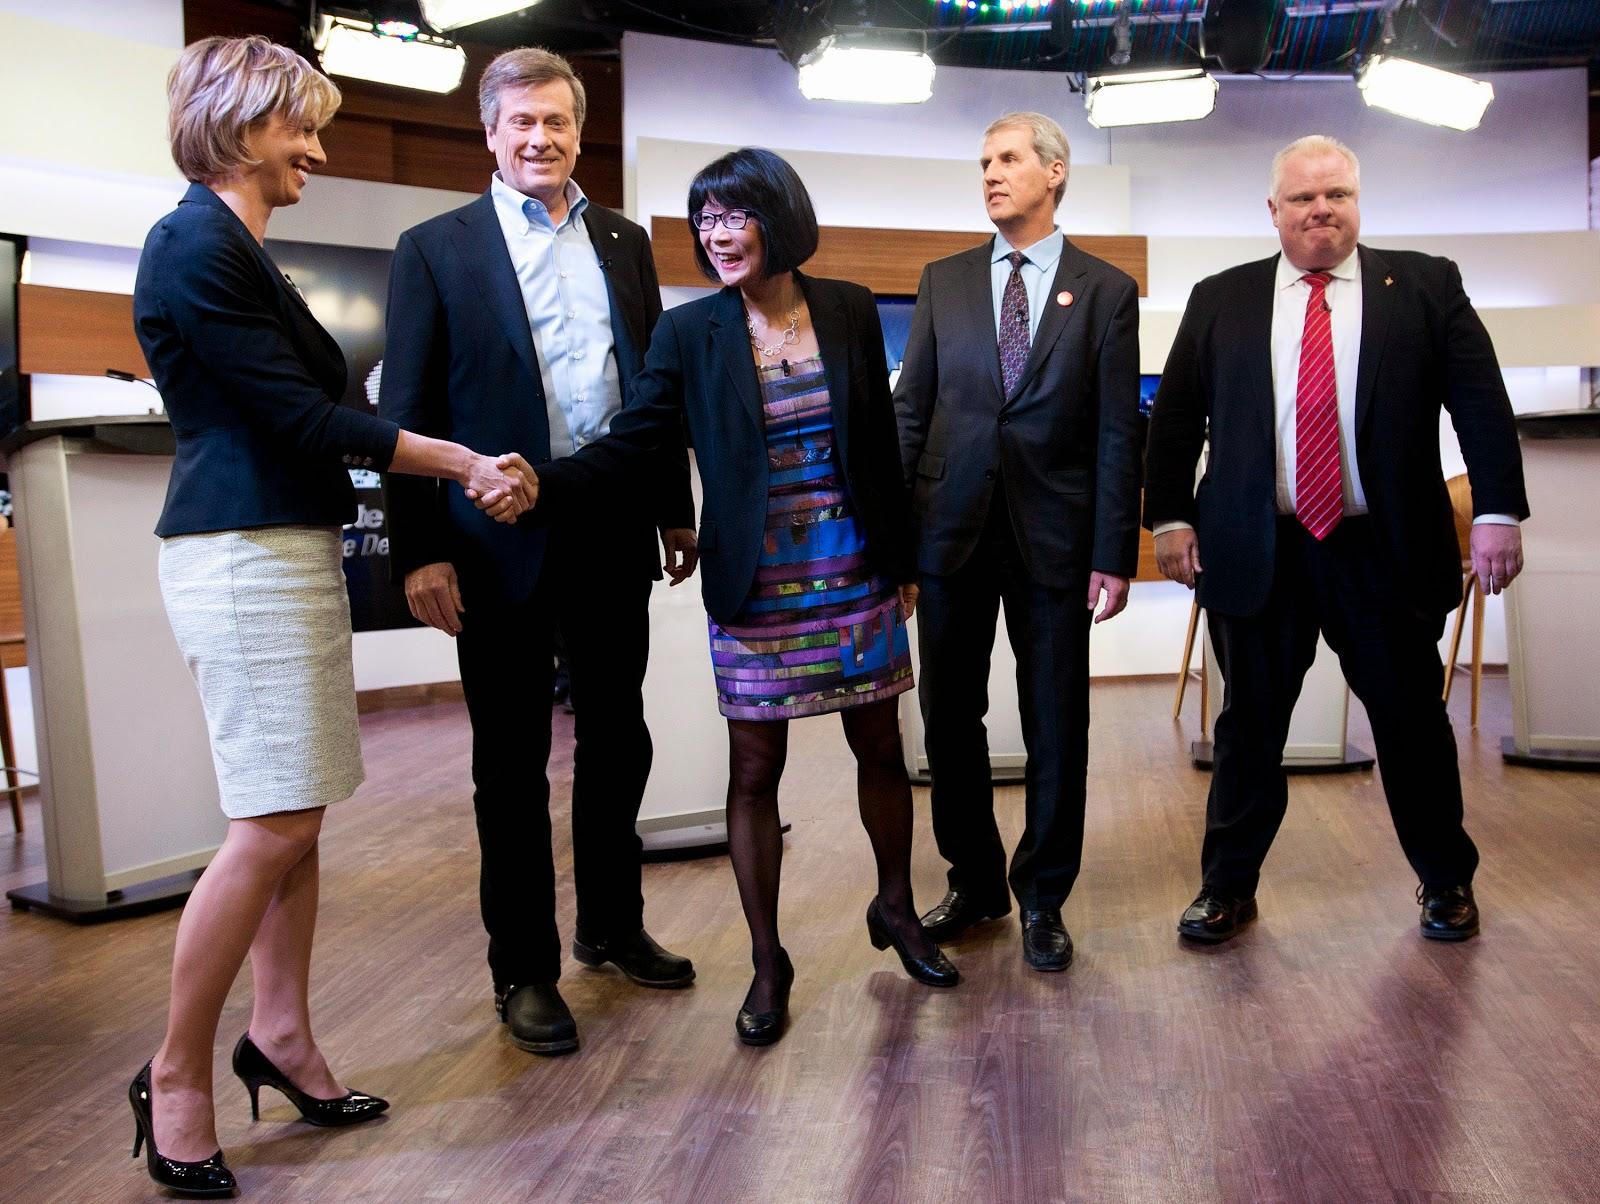 Karen Stintz, John Tory, Olivia Chow, David Soknacki, Rob Ford, debate March 26 2014.